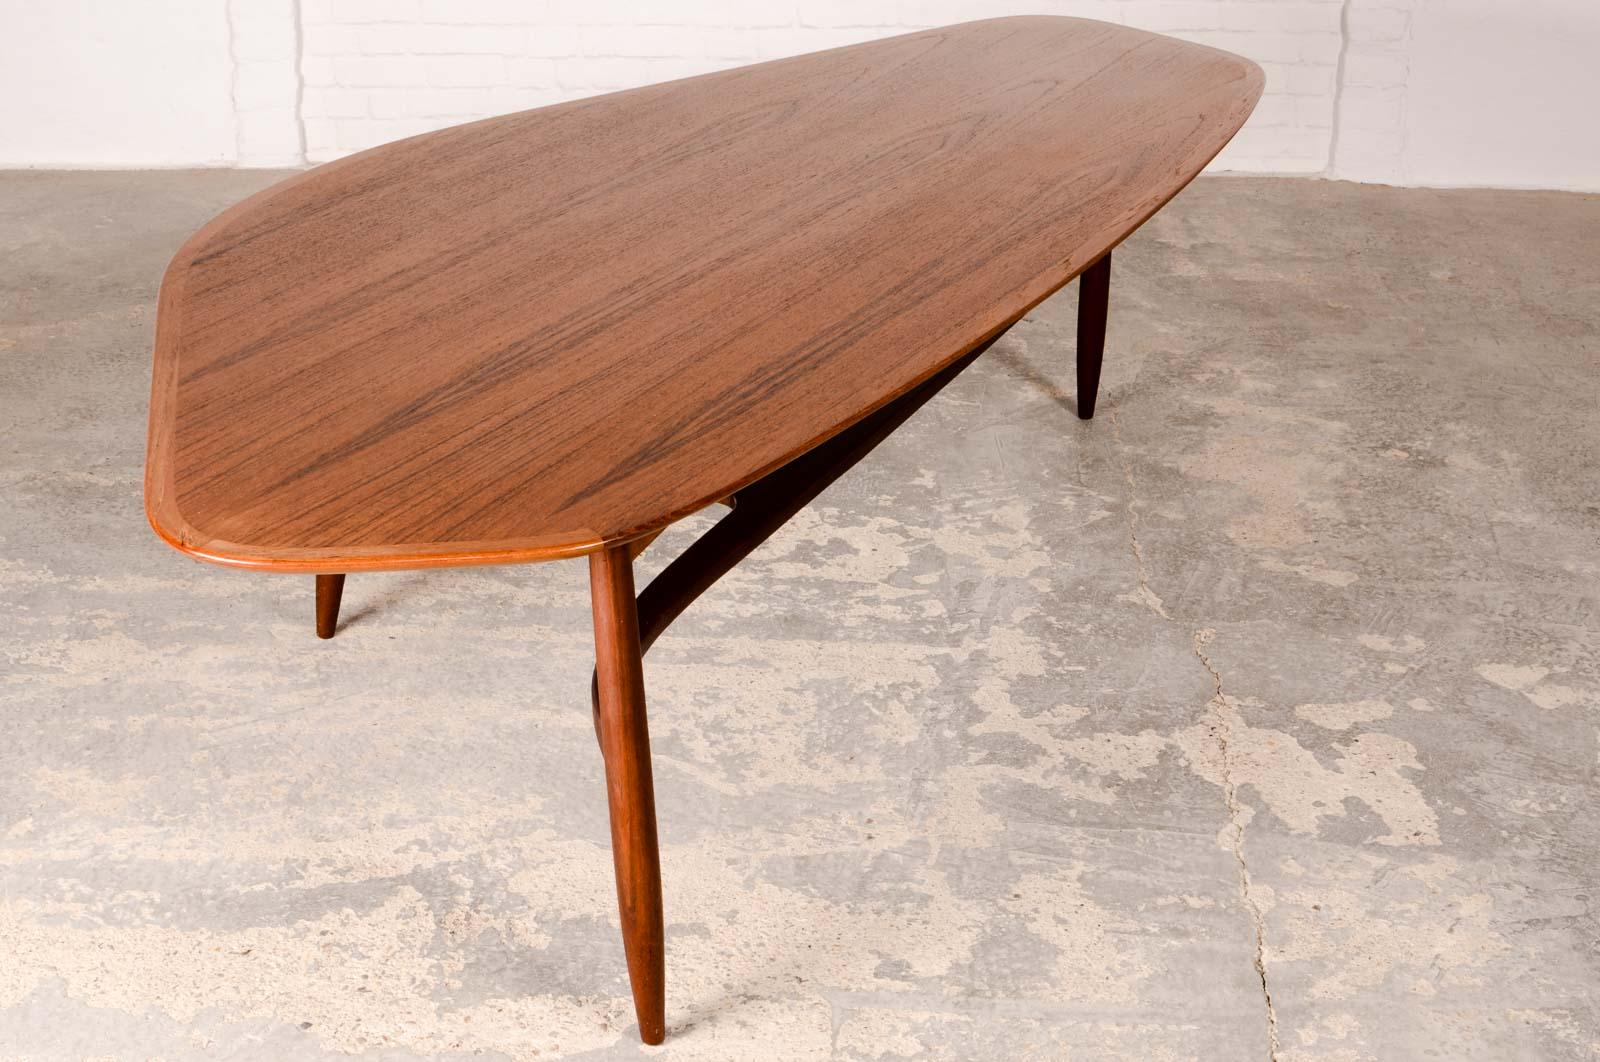 Mid Century Free Form Kidney Shaped Coffee Table Designed By Svante Skogh